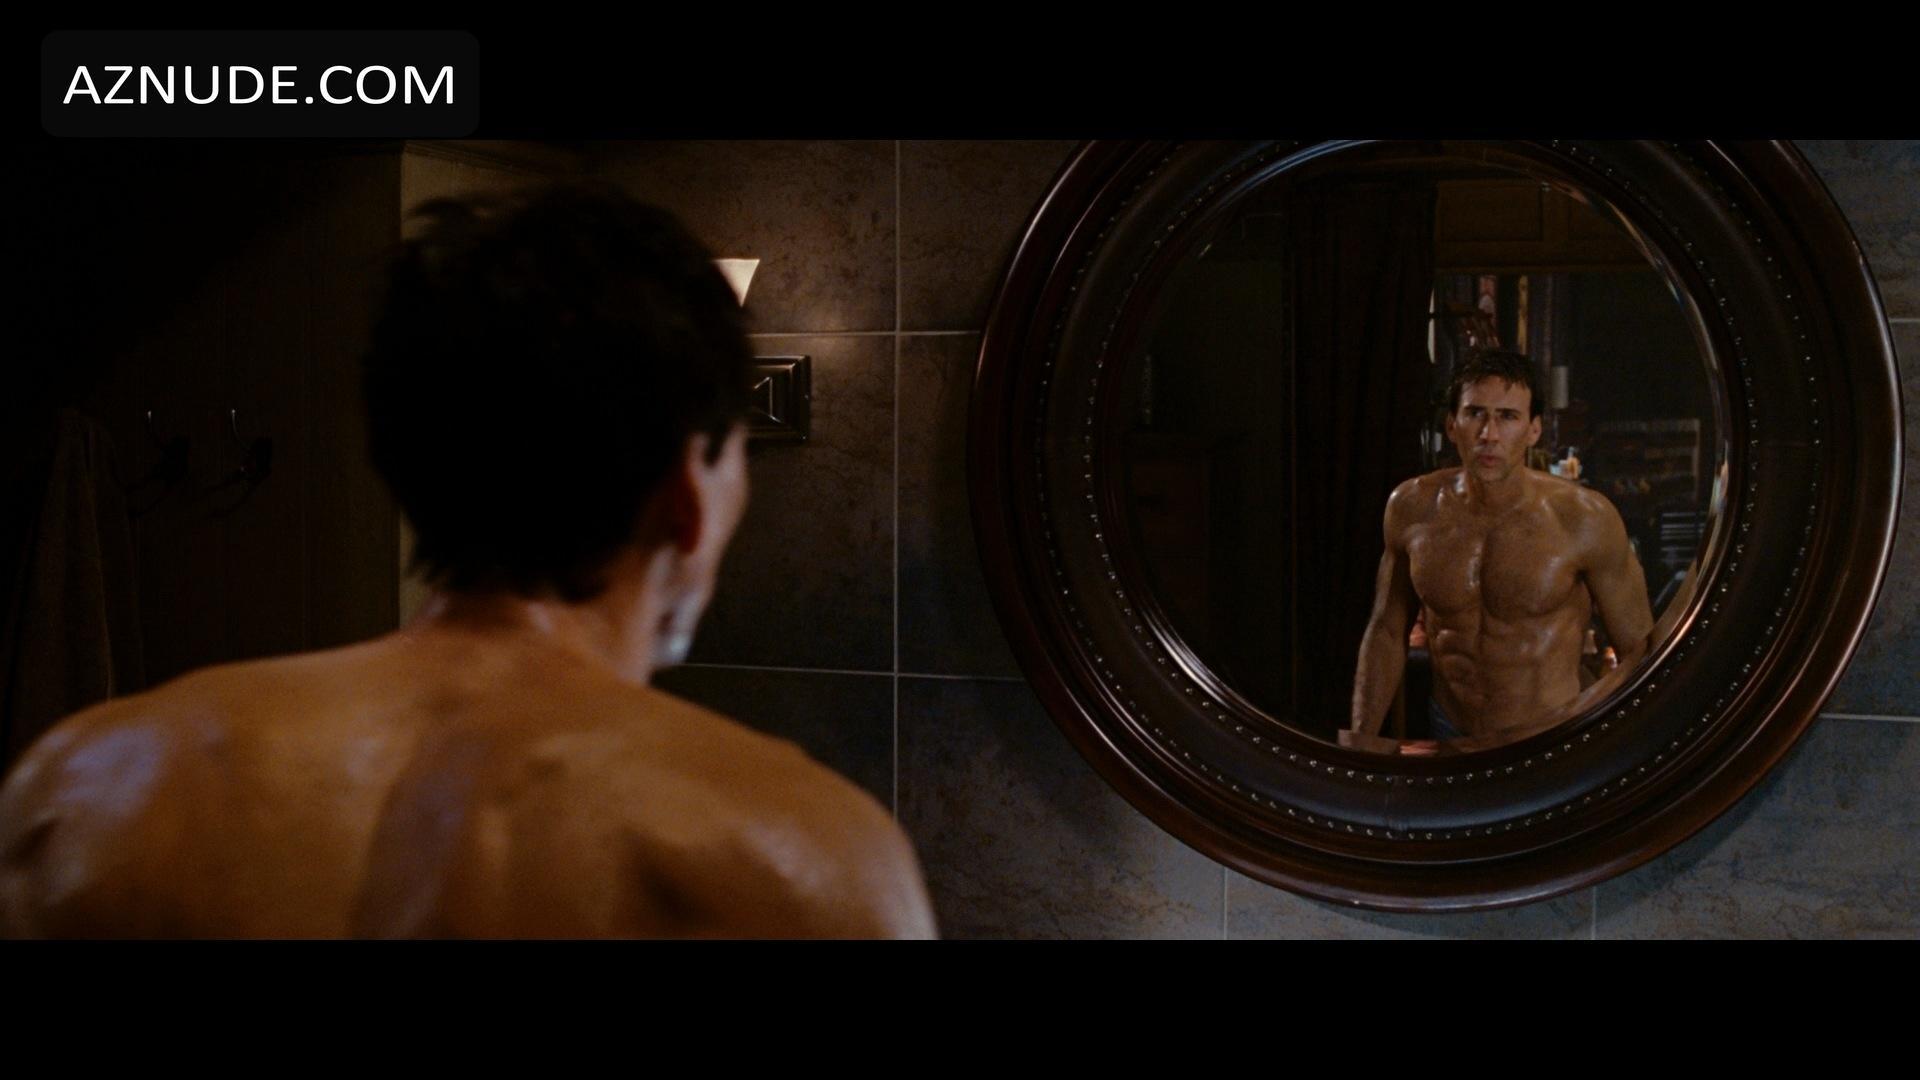 cam free gay nude video